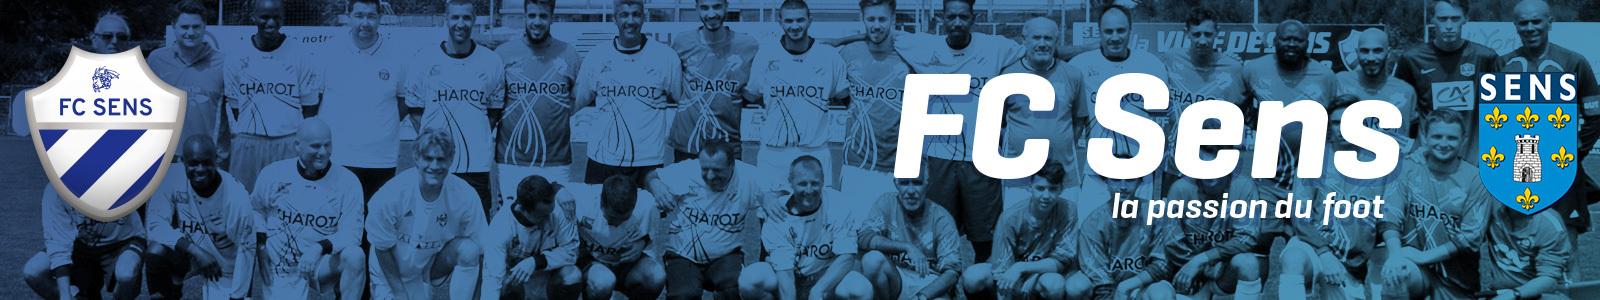 Actualit match du prochain week end club football football club de sens footeo - Reglement coupe gambardella ...